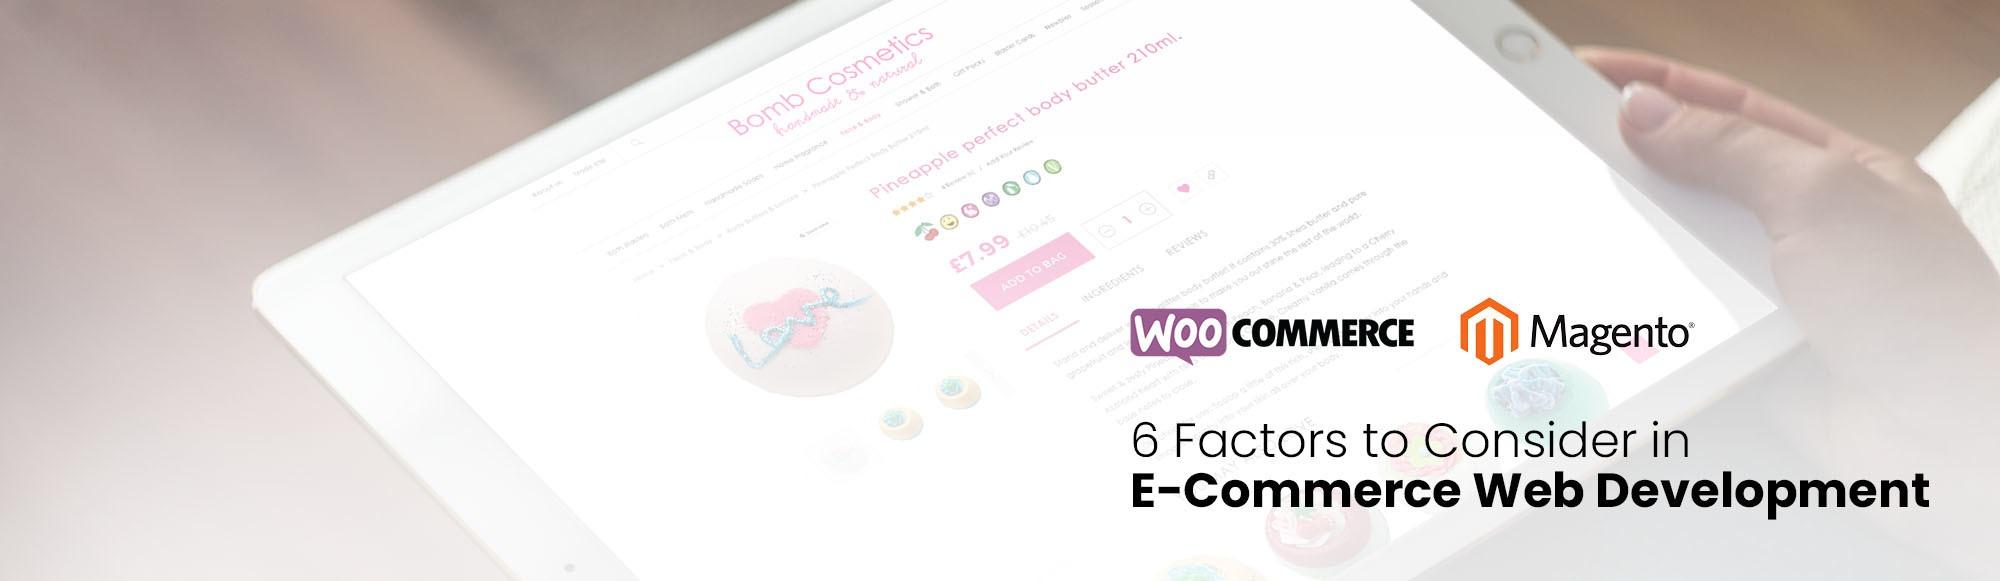 6 Factors to Consider In E-Commerce Web Development